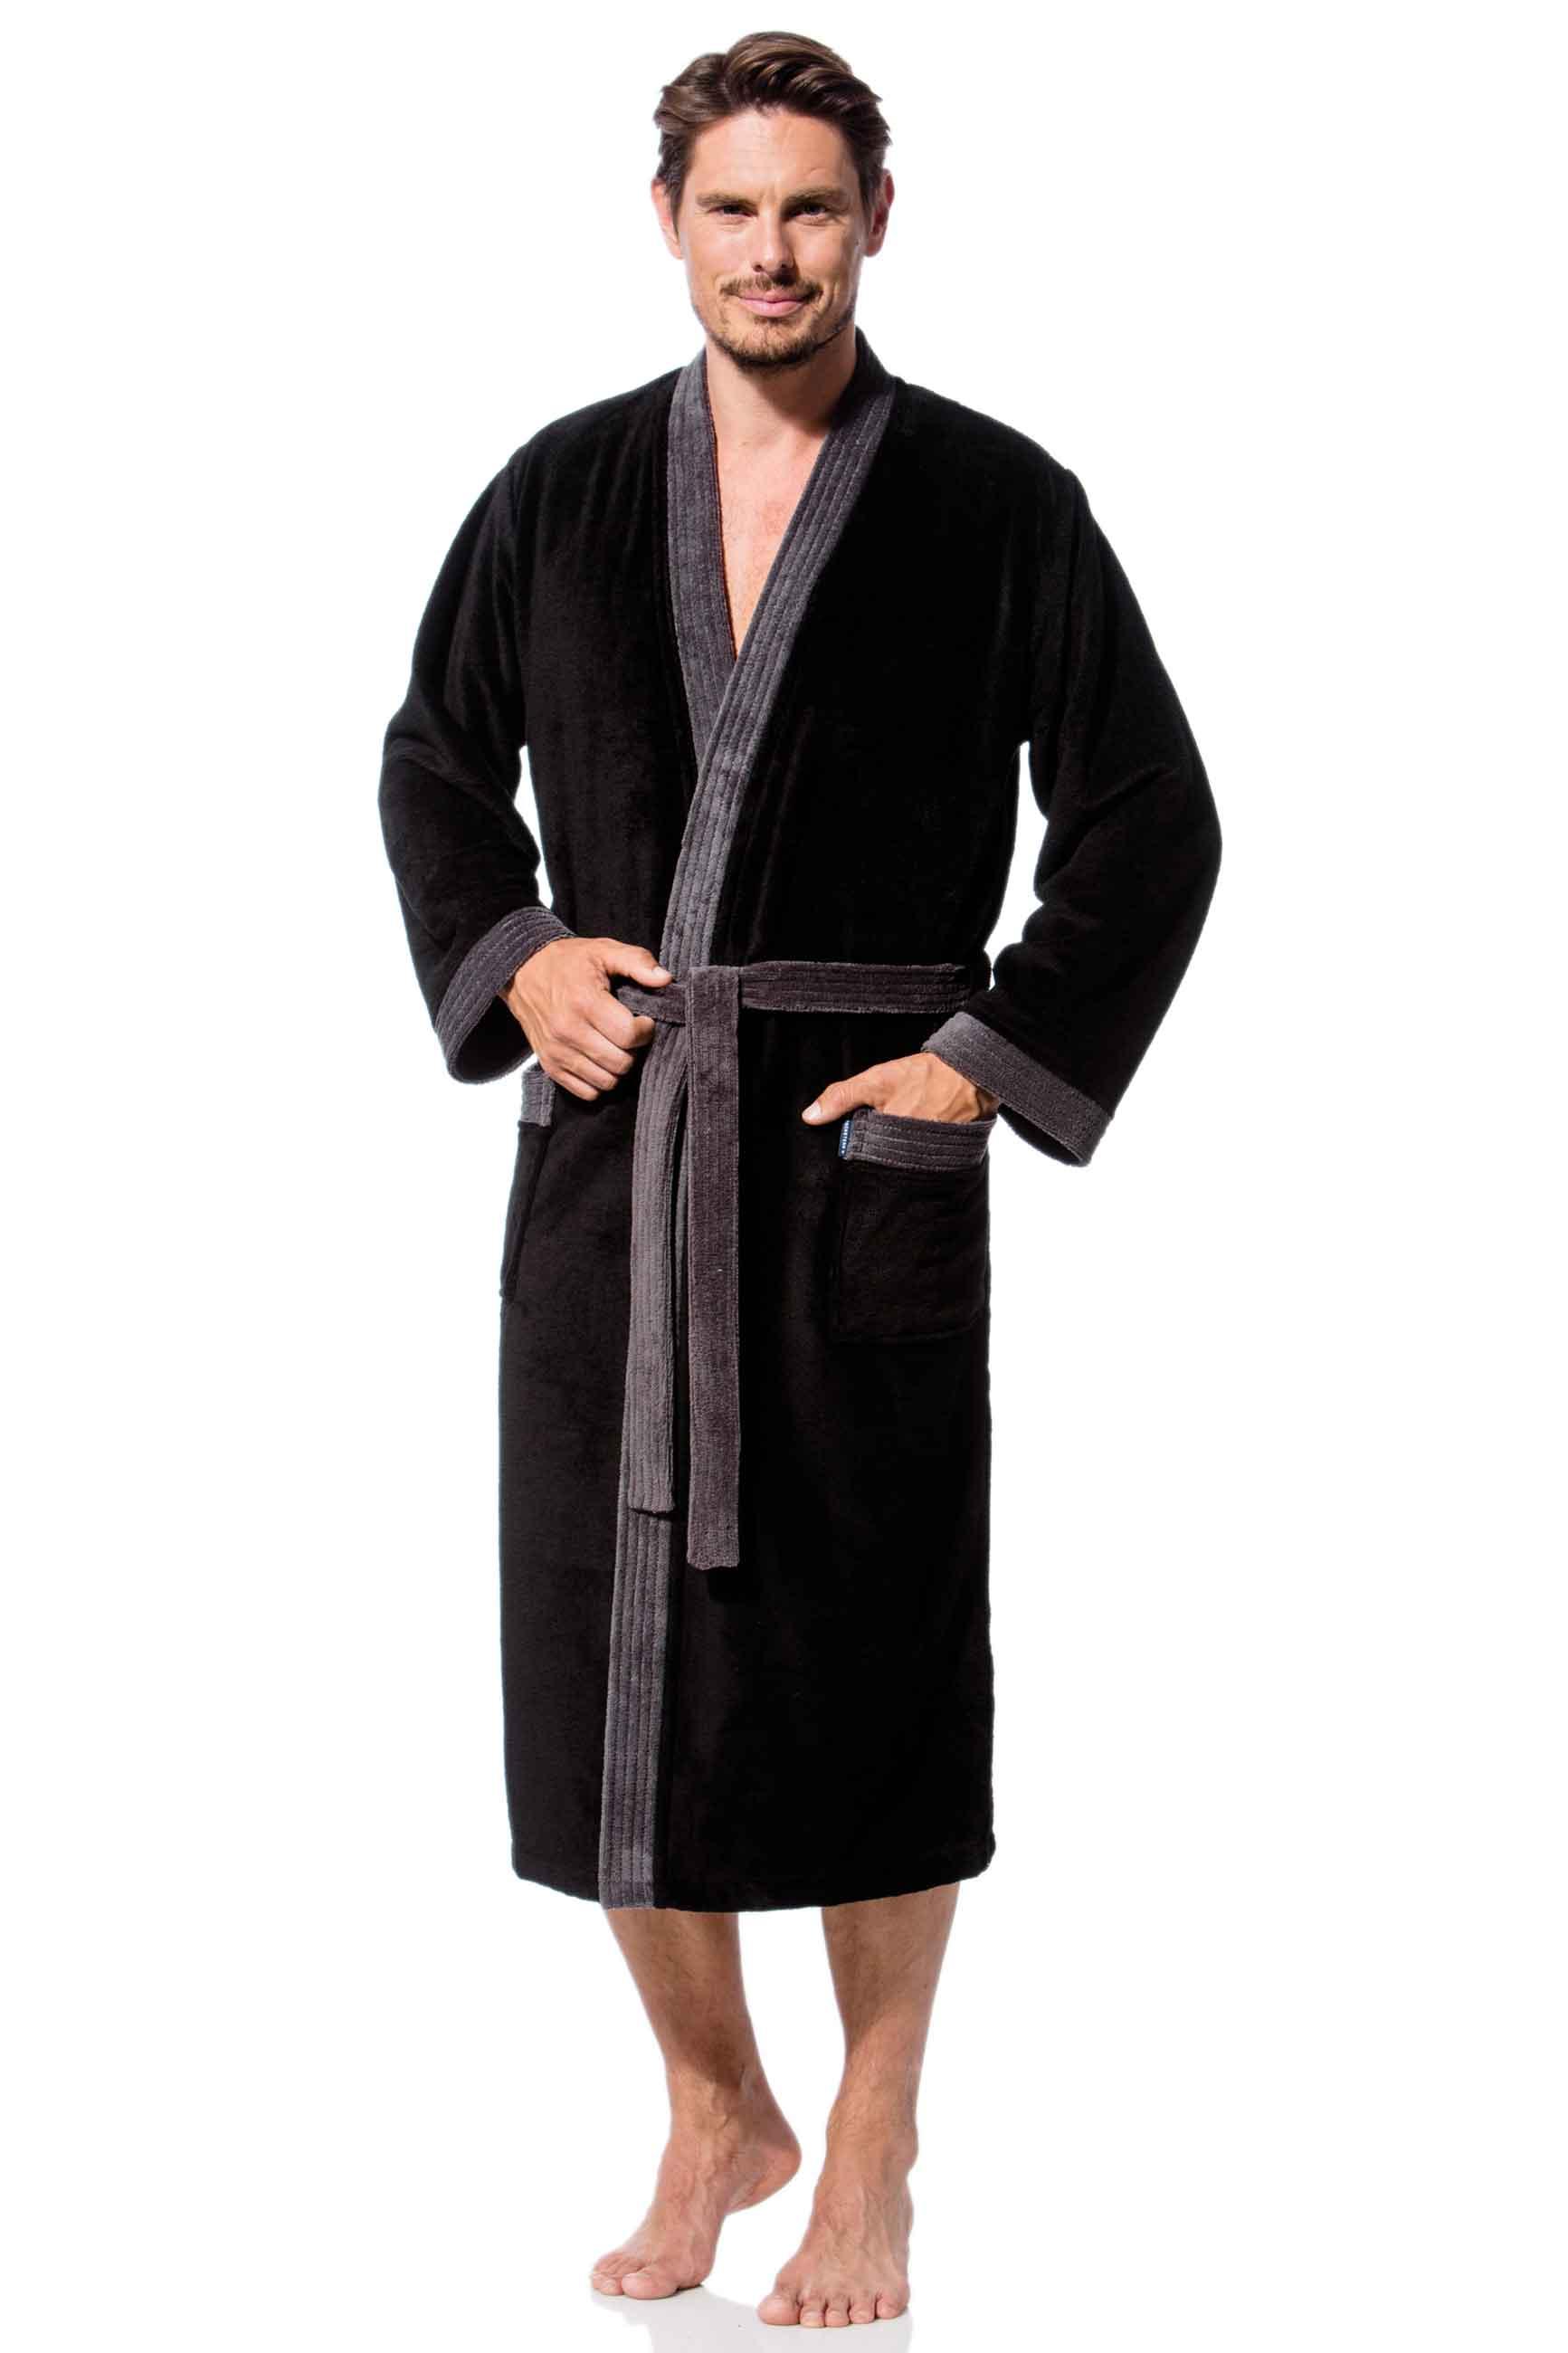 herren bademantel kimono in schwarz morgenstern. Black Bedroom Furniture Sets. Home Design Ideas